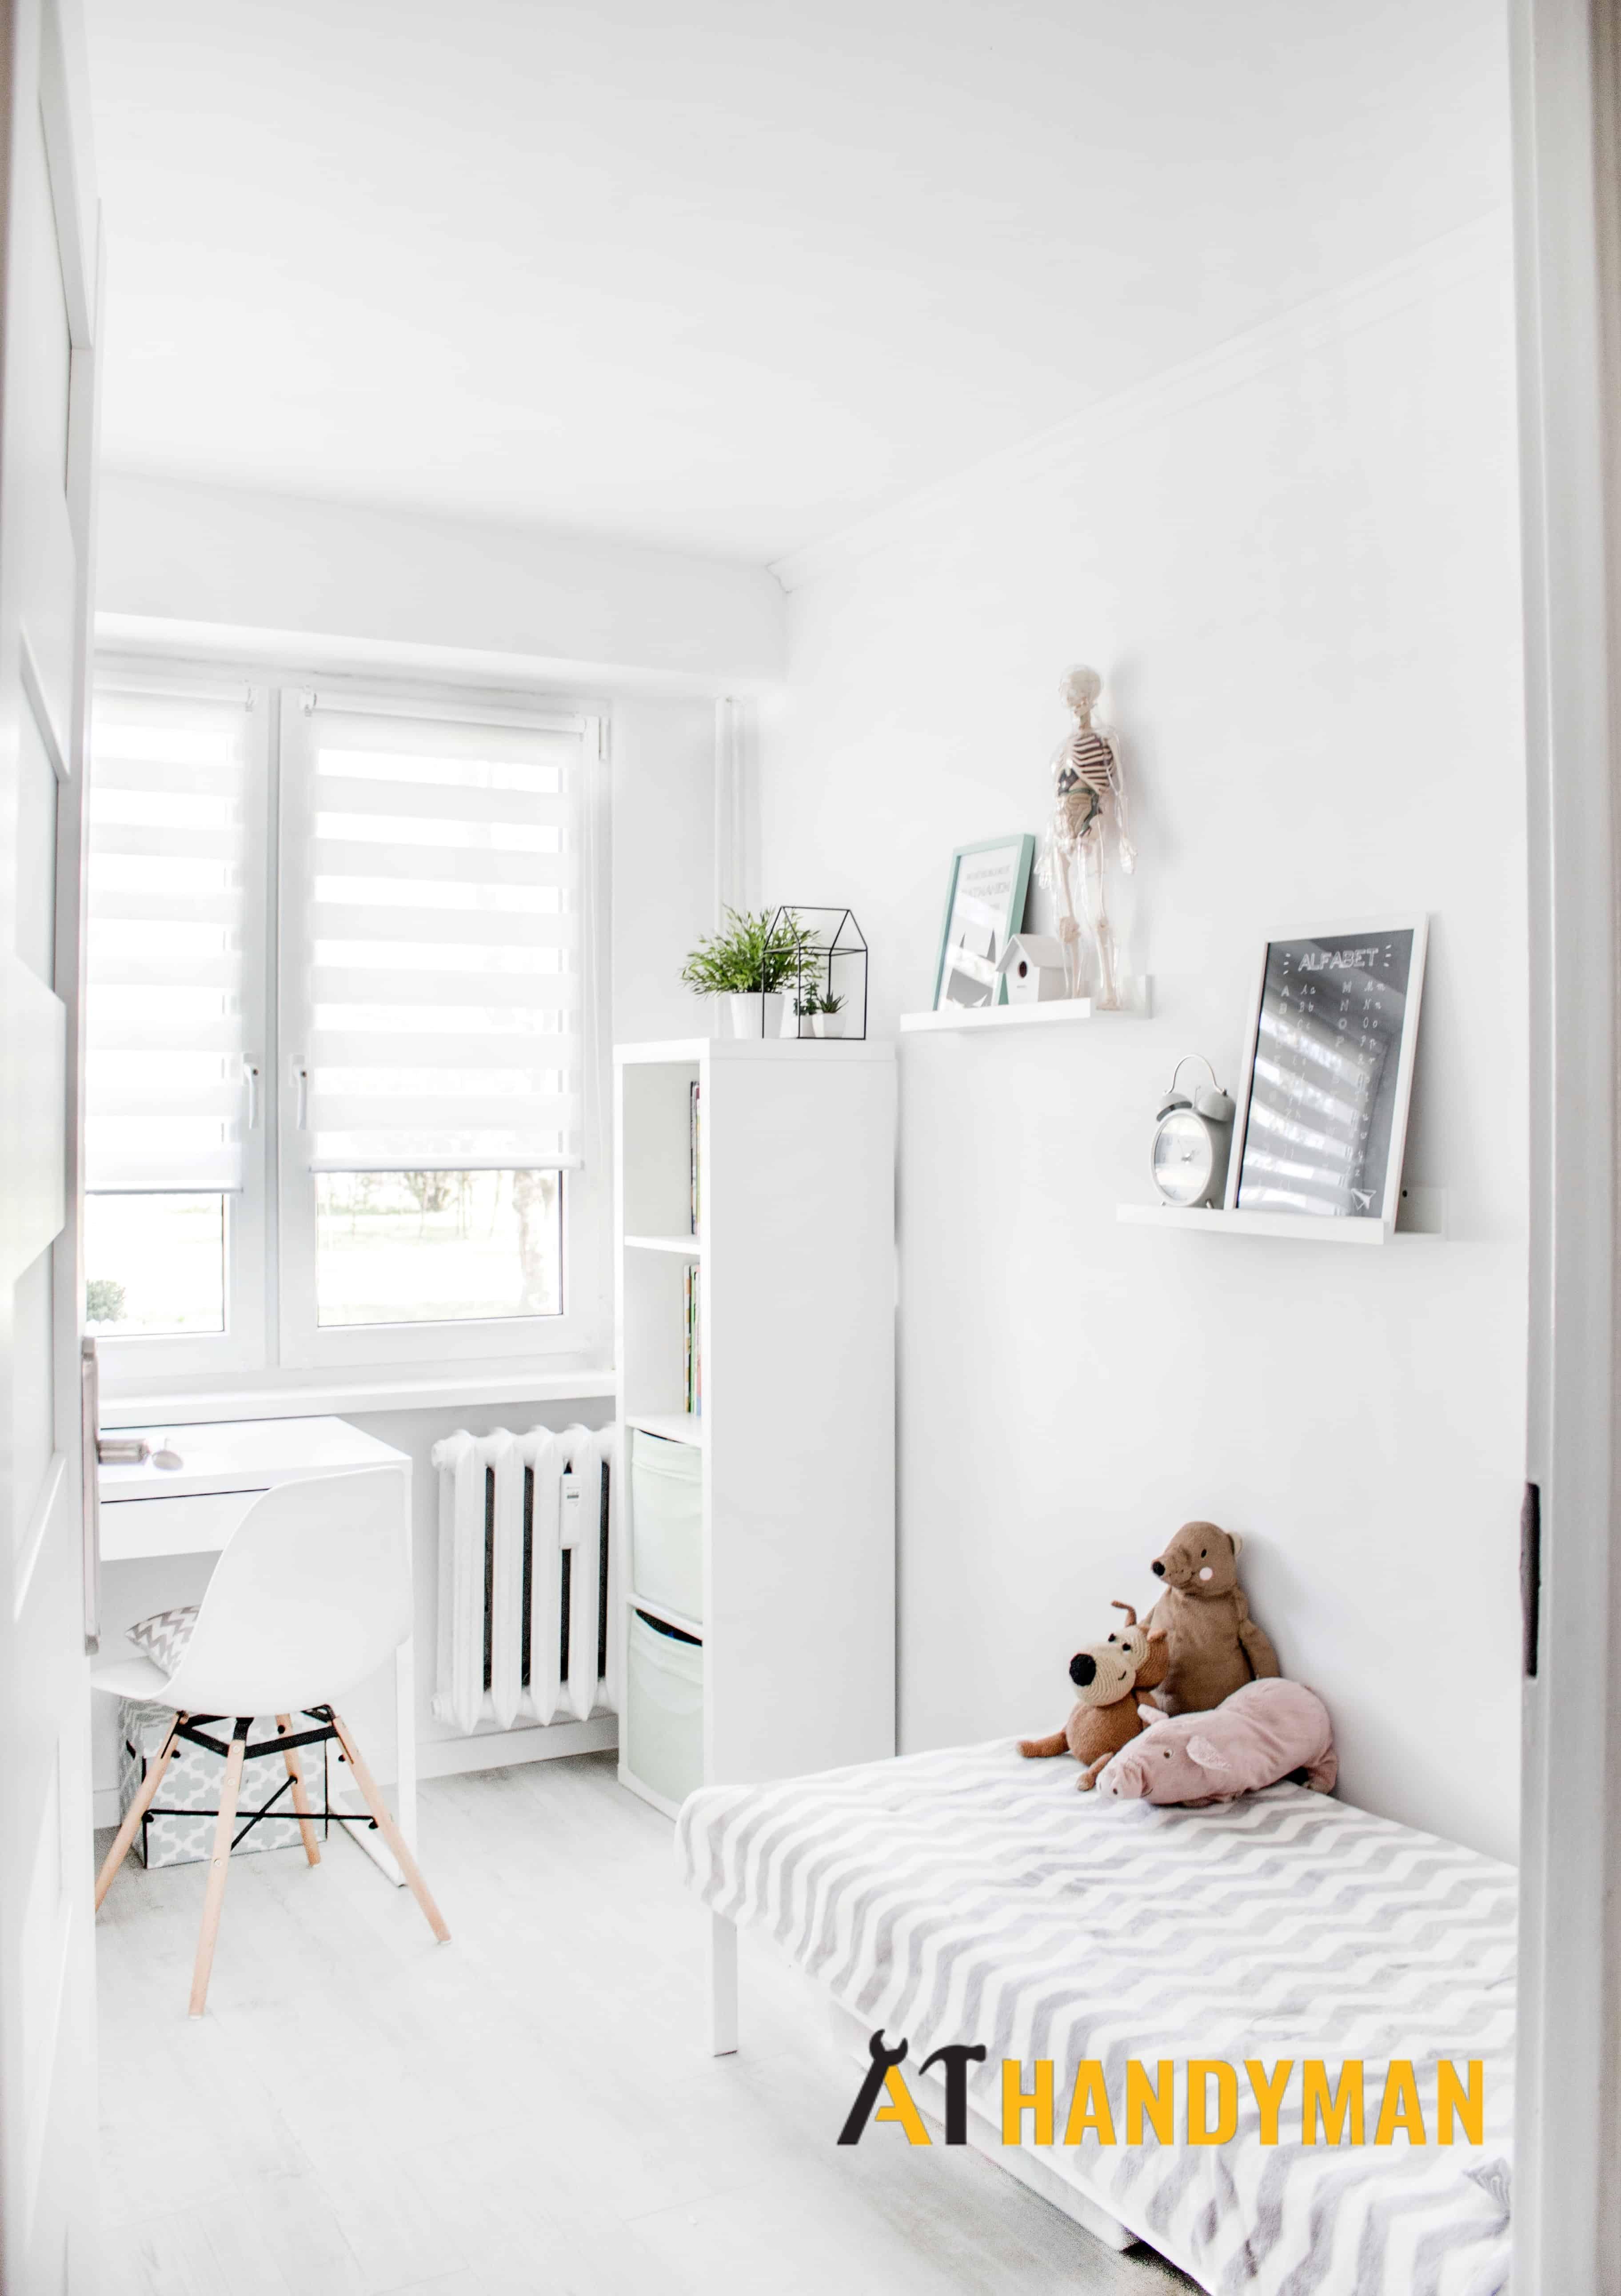 wall-mounted-shelves-installation-a1-handyman-singapore